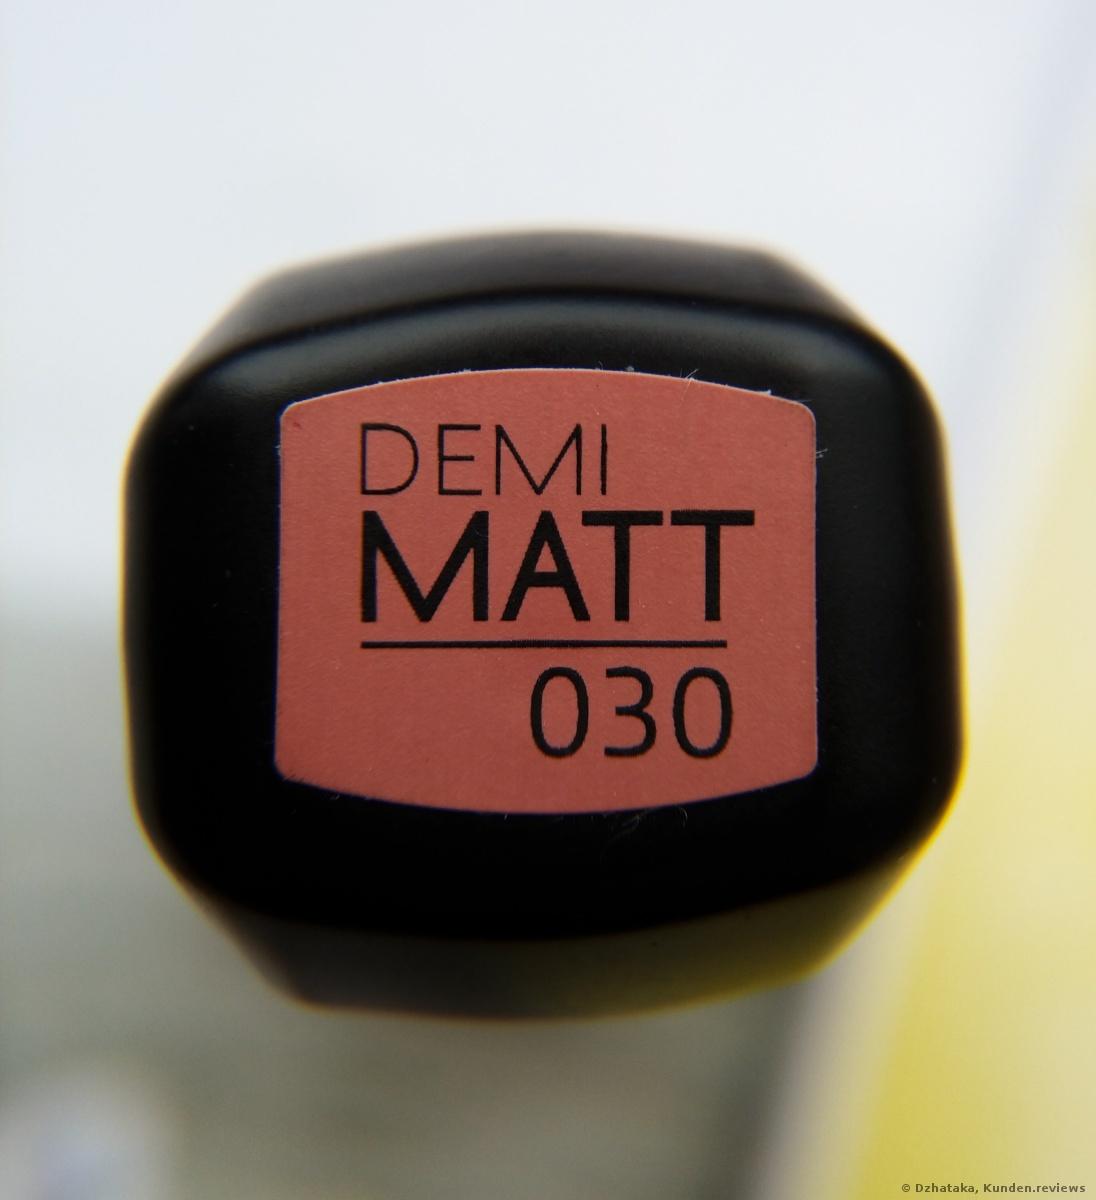 Catrice Demi Matt Lippenstift 030